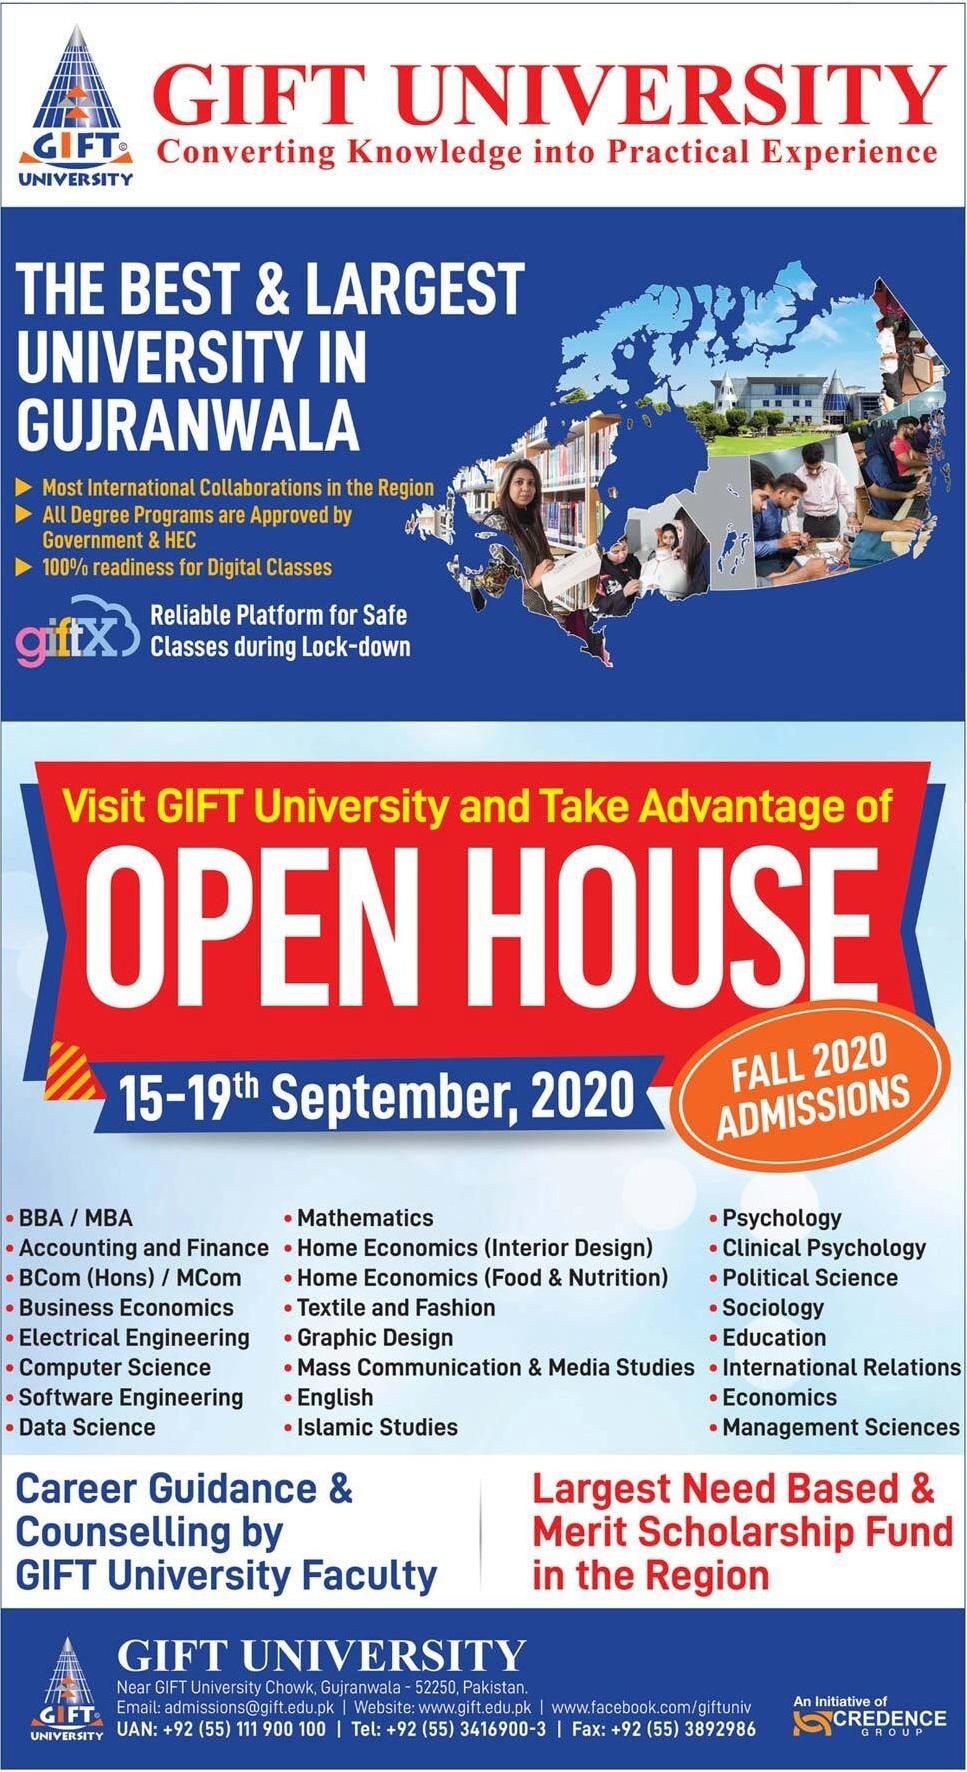 GIFT University Fall admission 2020 advertisement